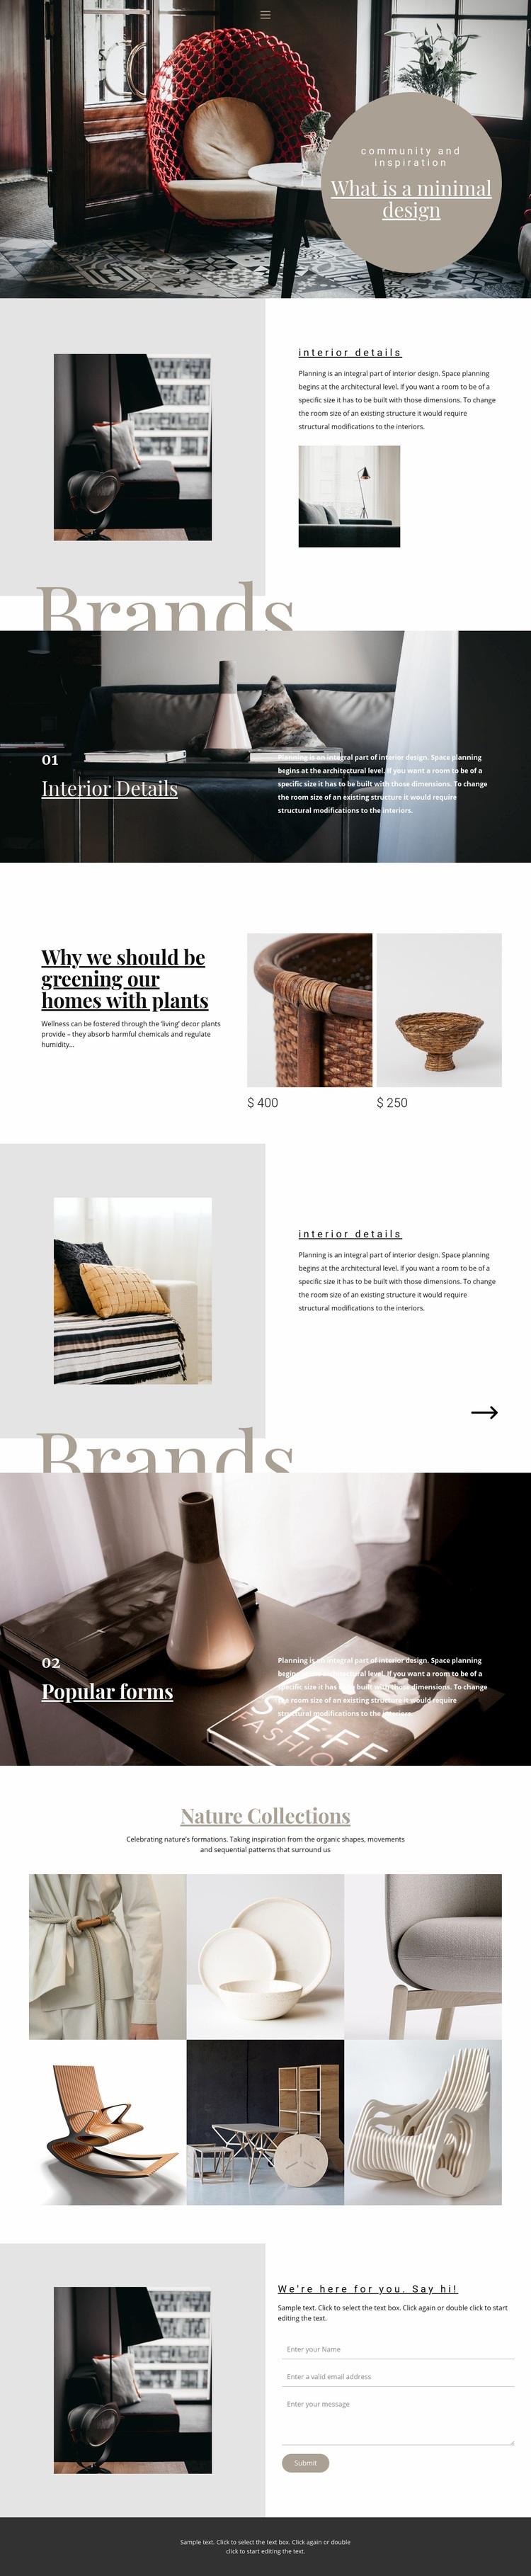 Interior brands Web Page Designer